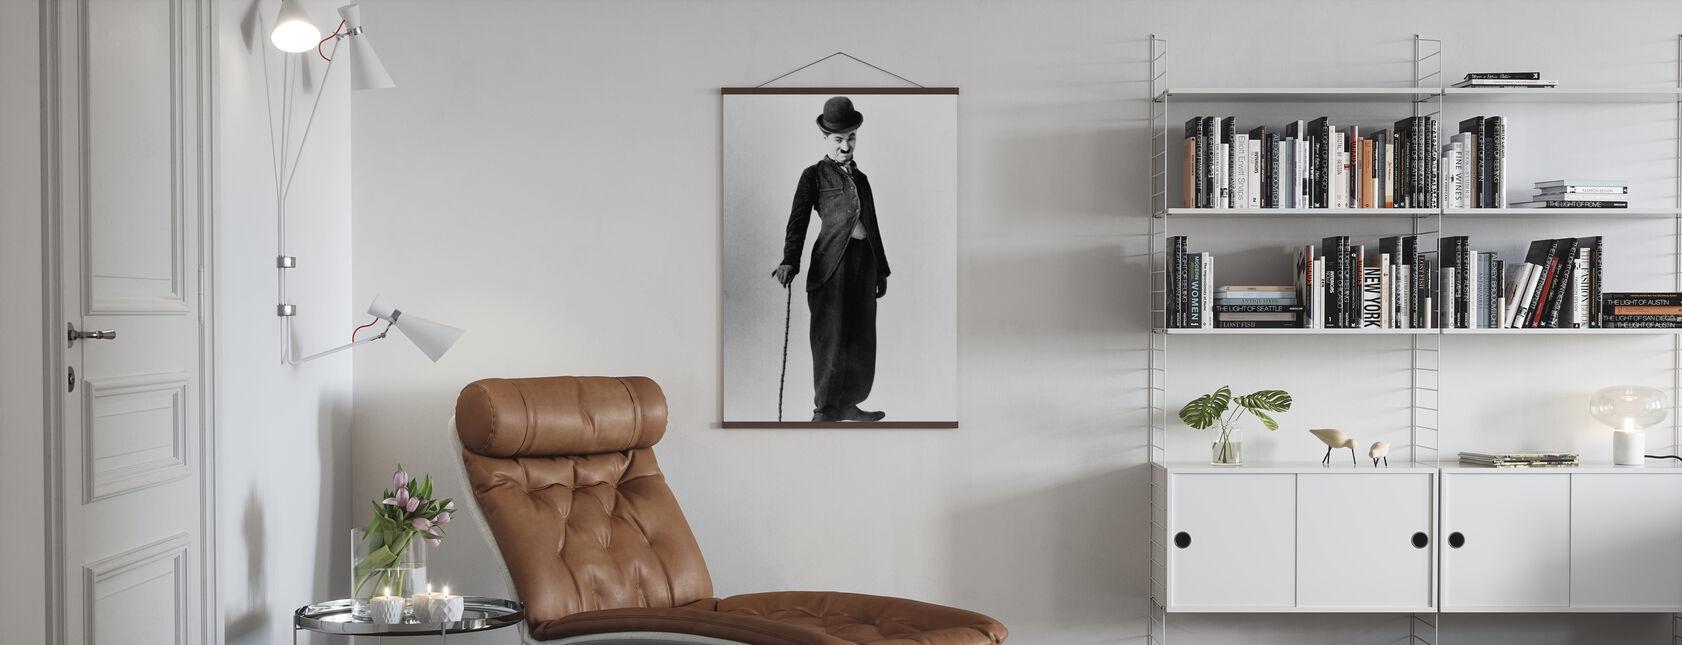 Vagabondo - Charlie Chaplin - Poster - Salotto